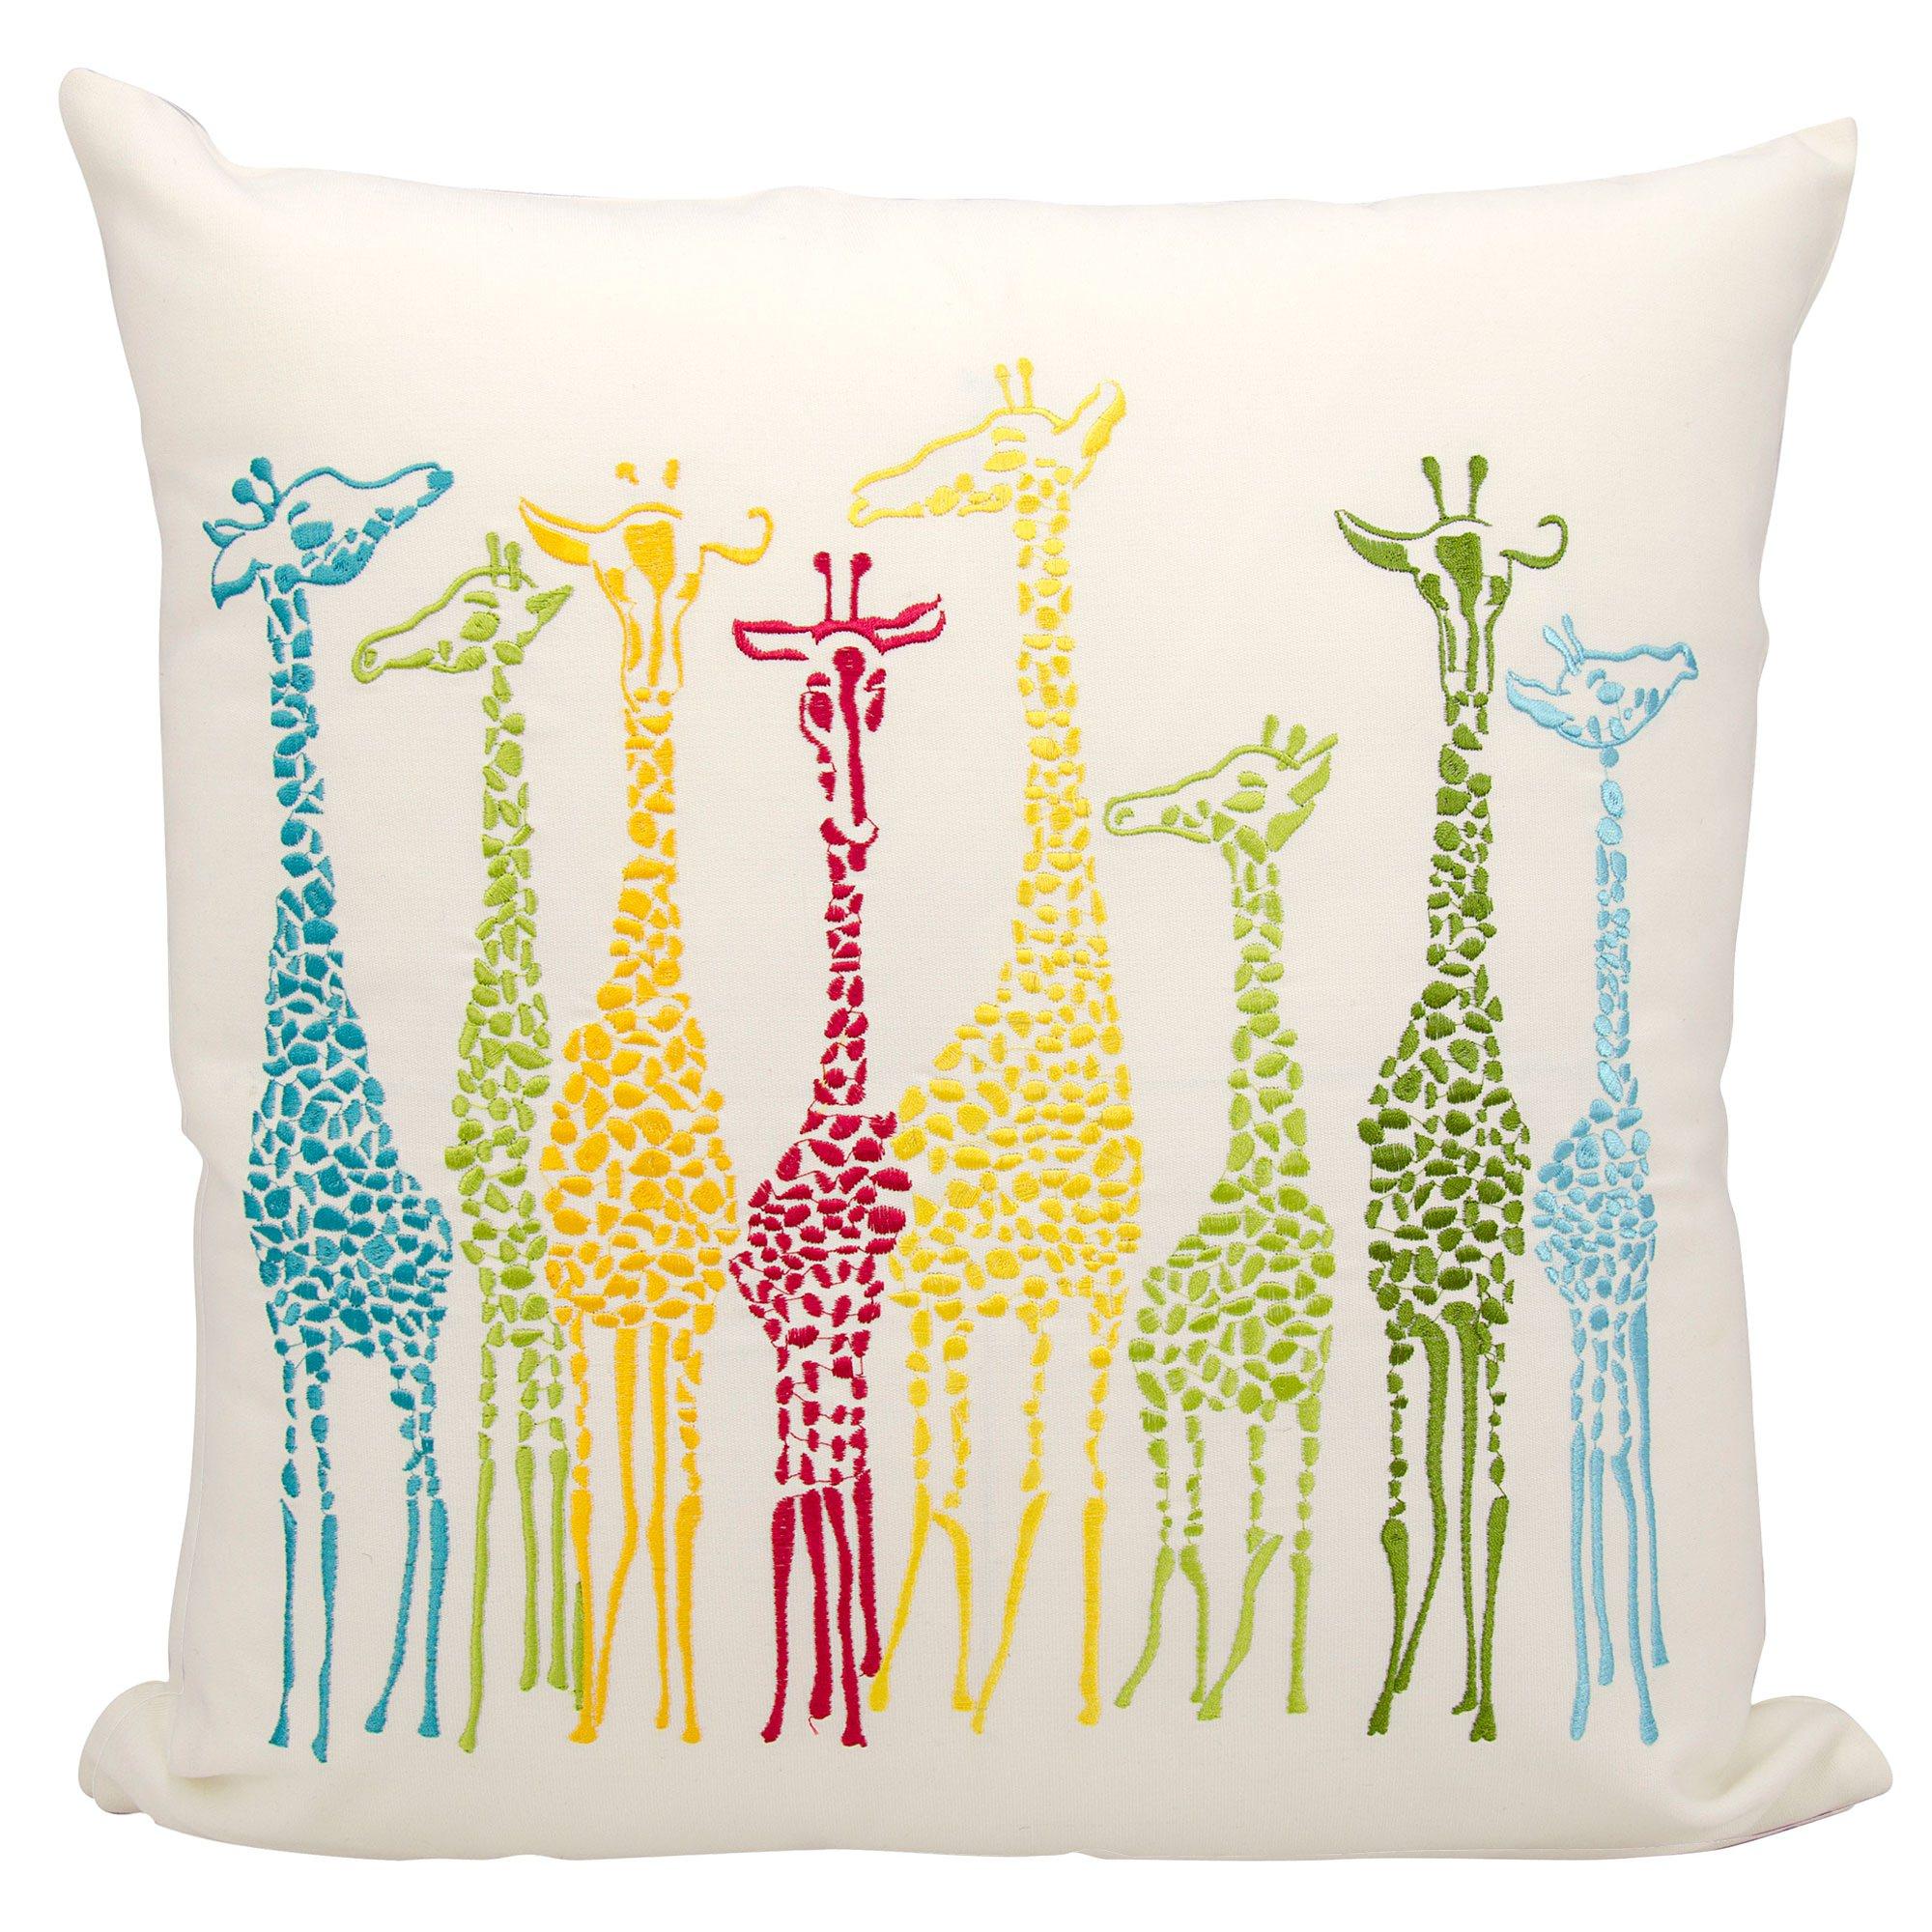 Multicolor Giraffe Embroidered Pillow 20 x 20  DFOHome